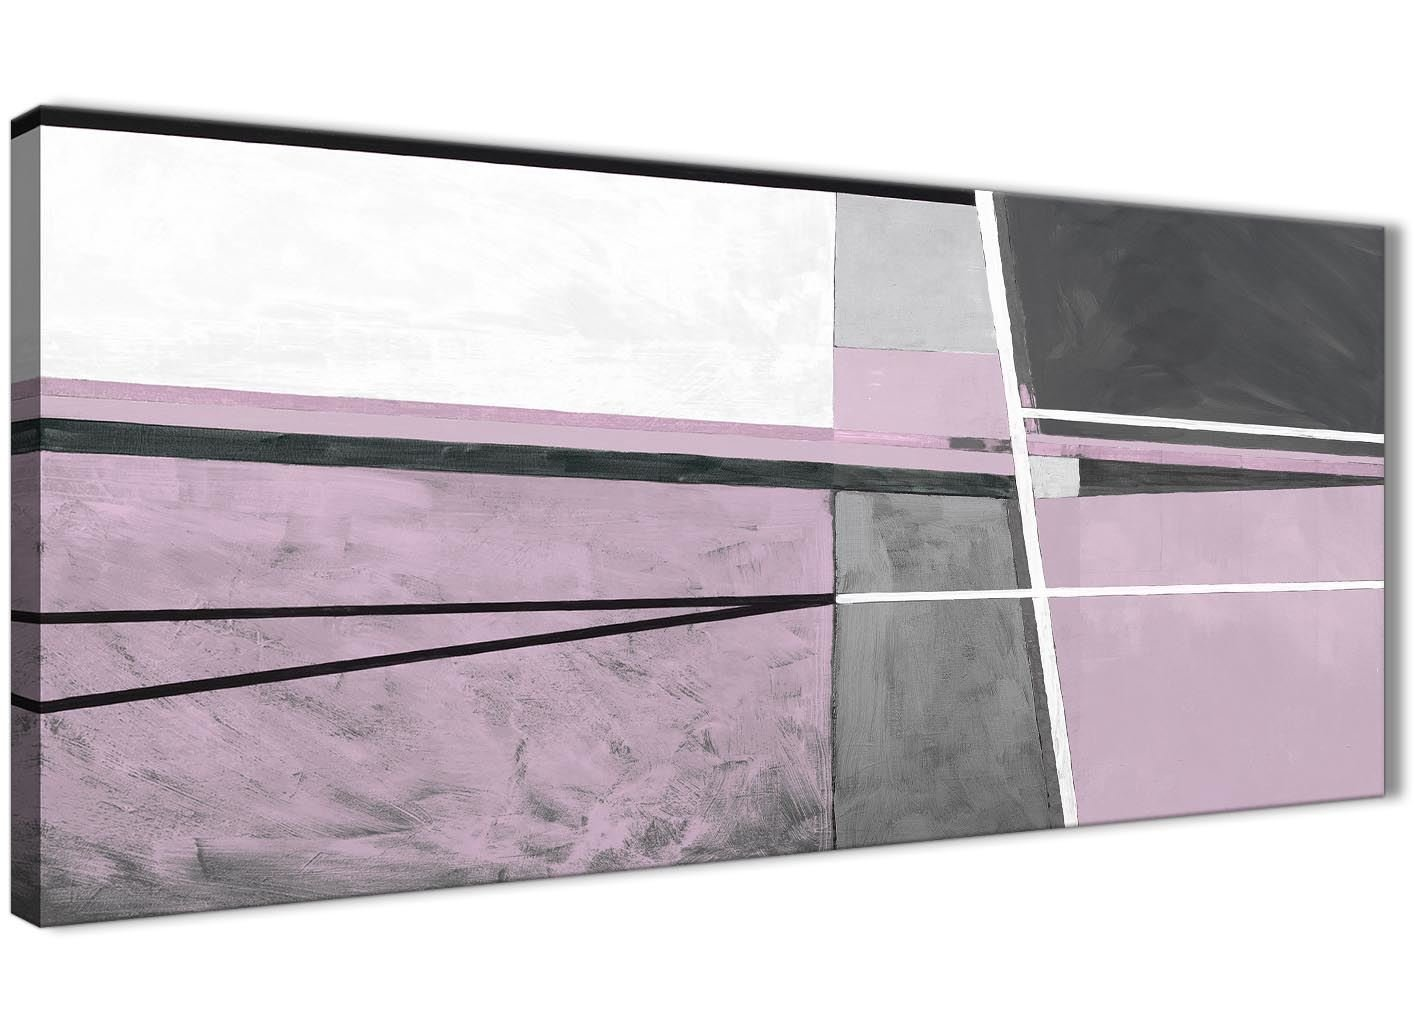 Lila Grau Wandbild Ölgemälde Wohnzimmer Leinwand Kunstdruck Zubehör–Abstrakt 1395–120cm Print Wallfillers